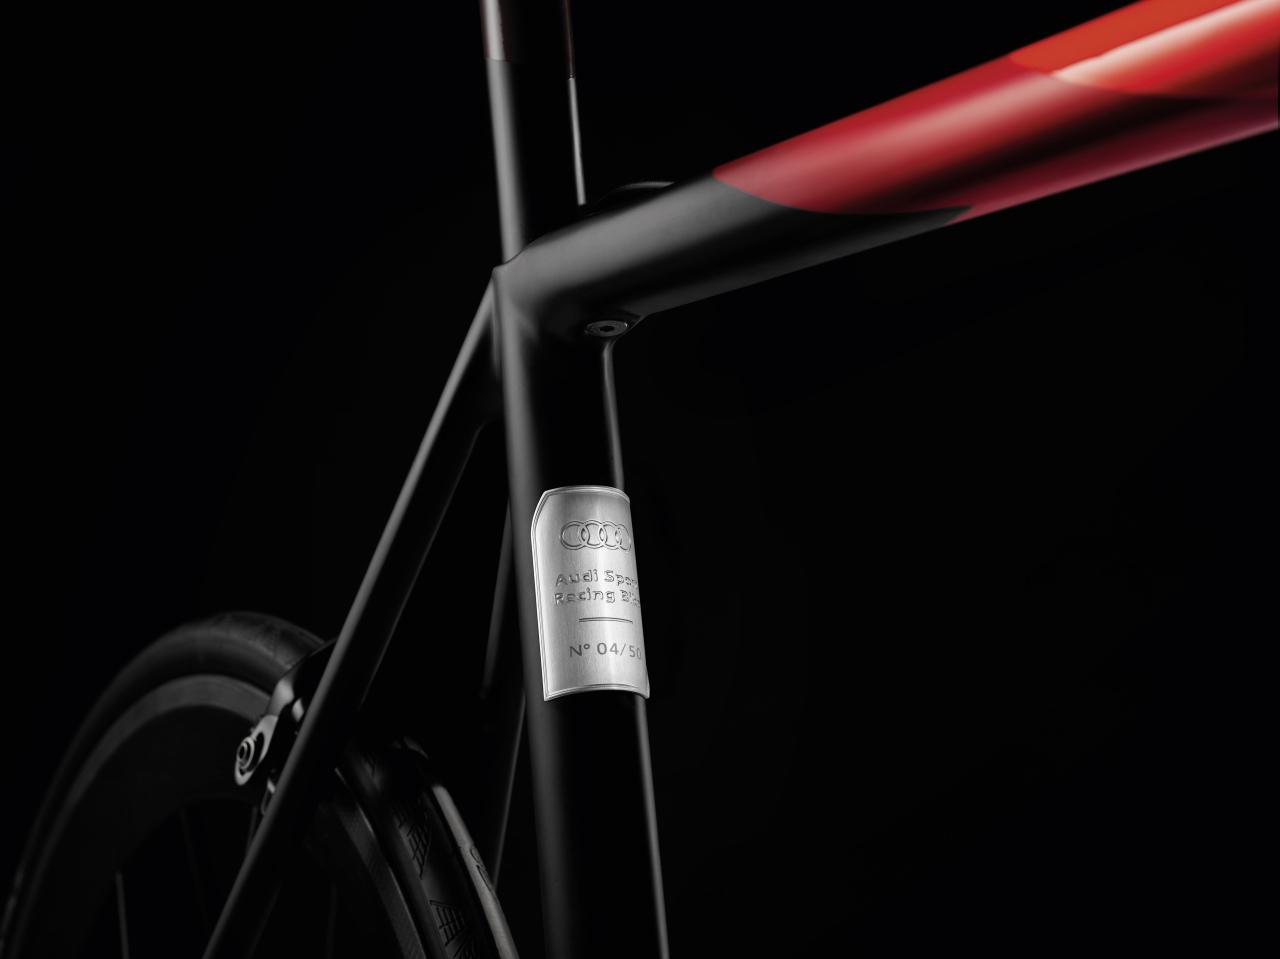 audi sport racing bike le v lo d 39 exception d 39 ingolstadt photo 2 l 39 argus. Black Bedroom Furniture Sets. Home Design Ideas